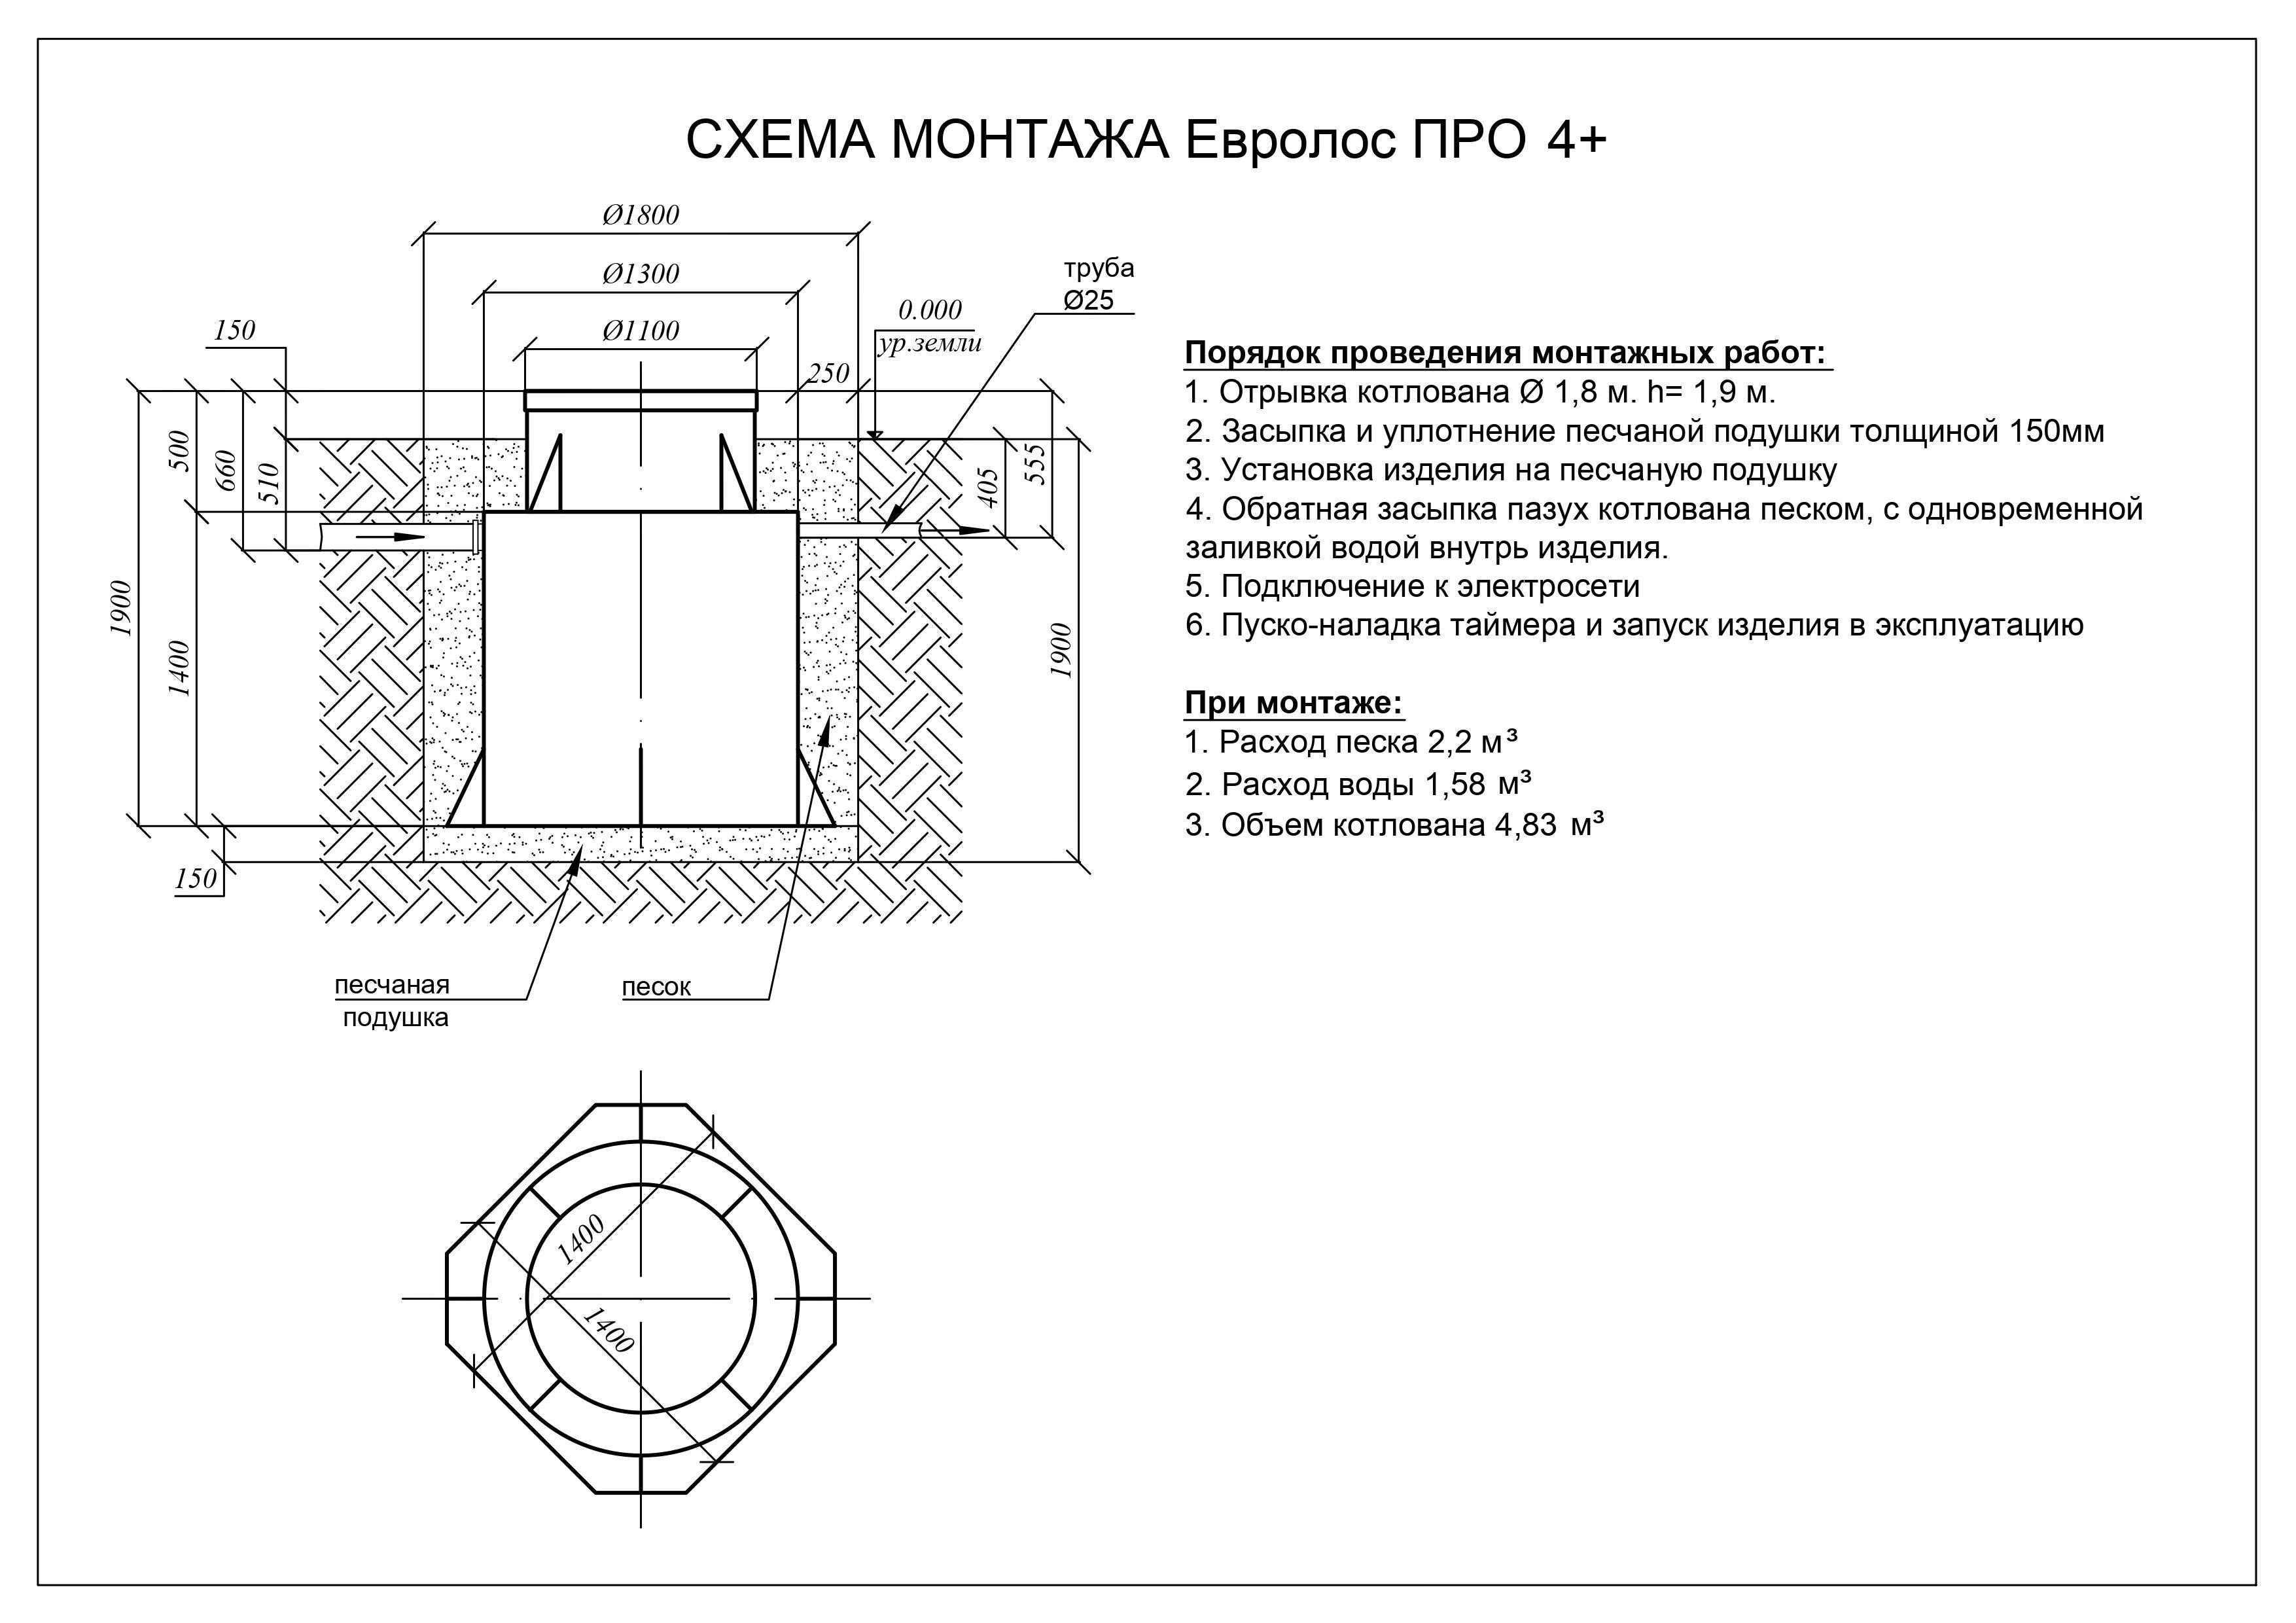 Схема монтажа станции очистки Евролос ПРО 4 +